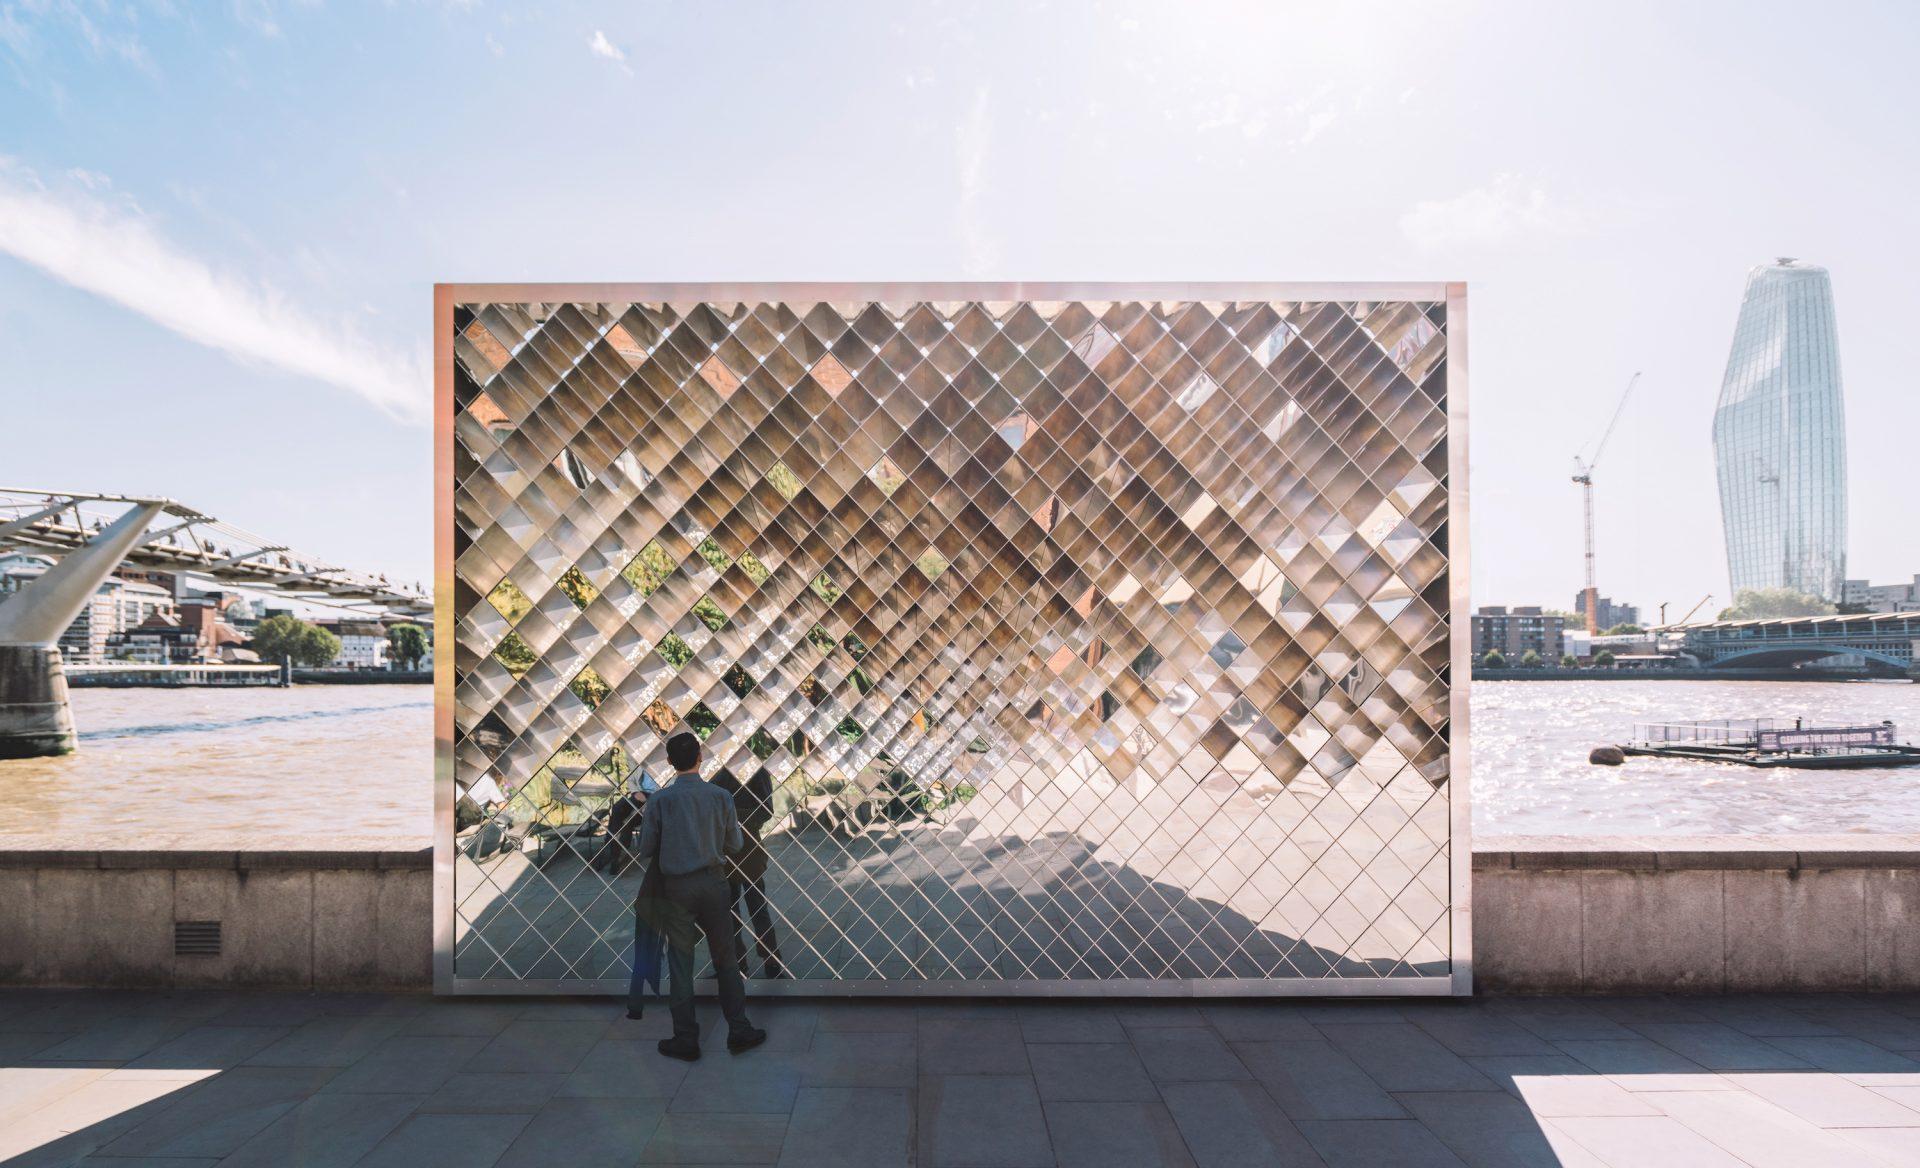 LFA and City of London Corporation reveal Wolfgang Buttress' winning 'Liminal' installation